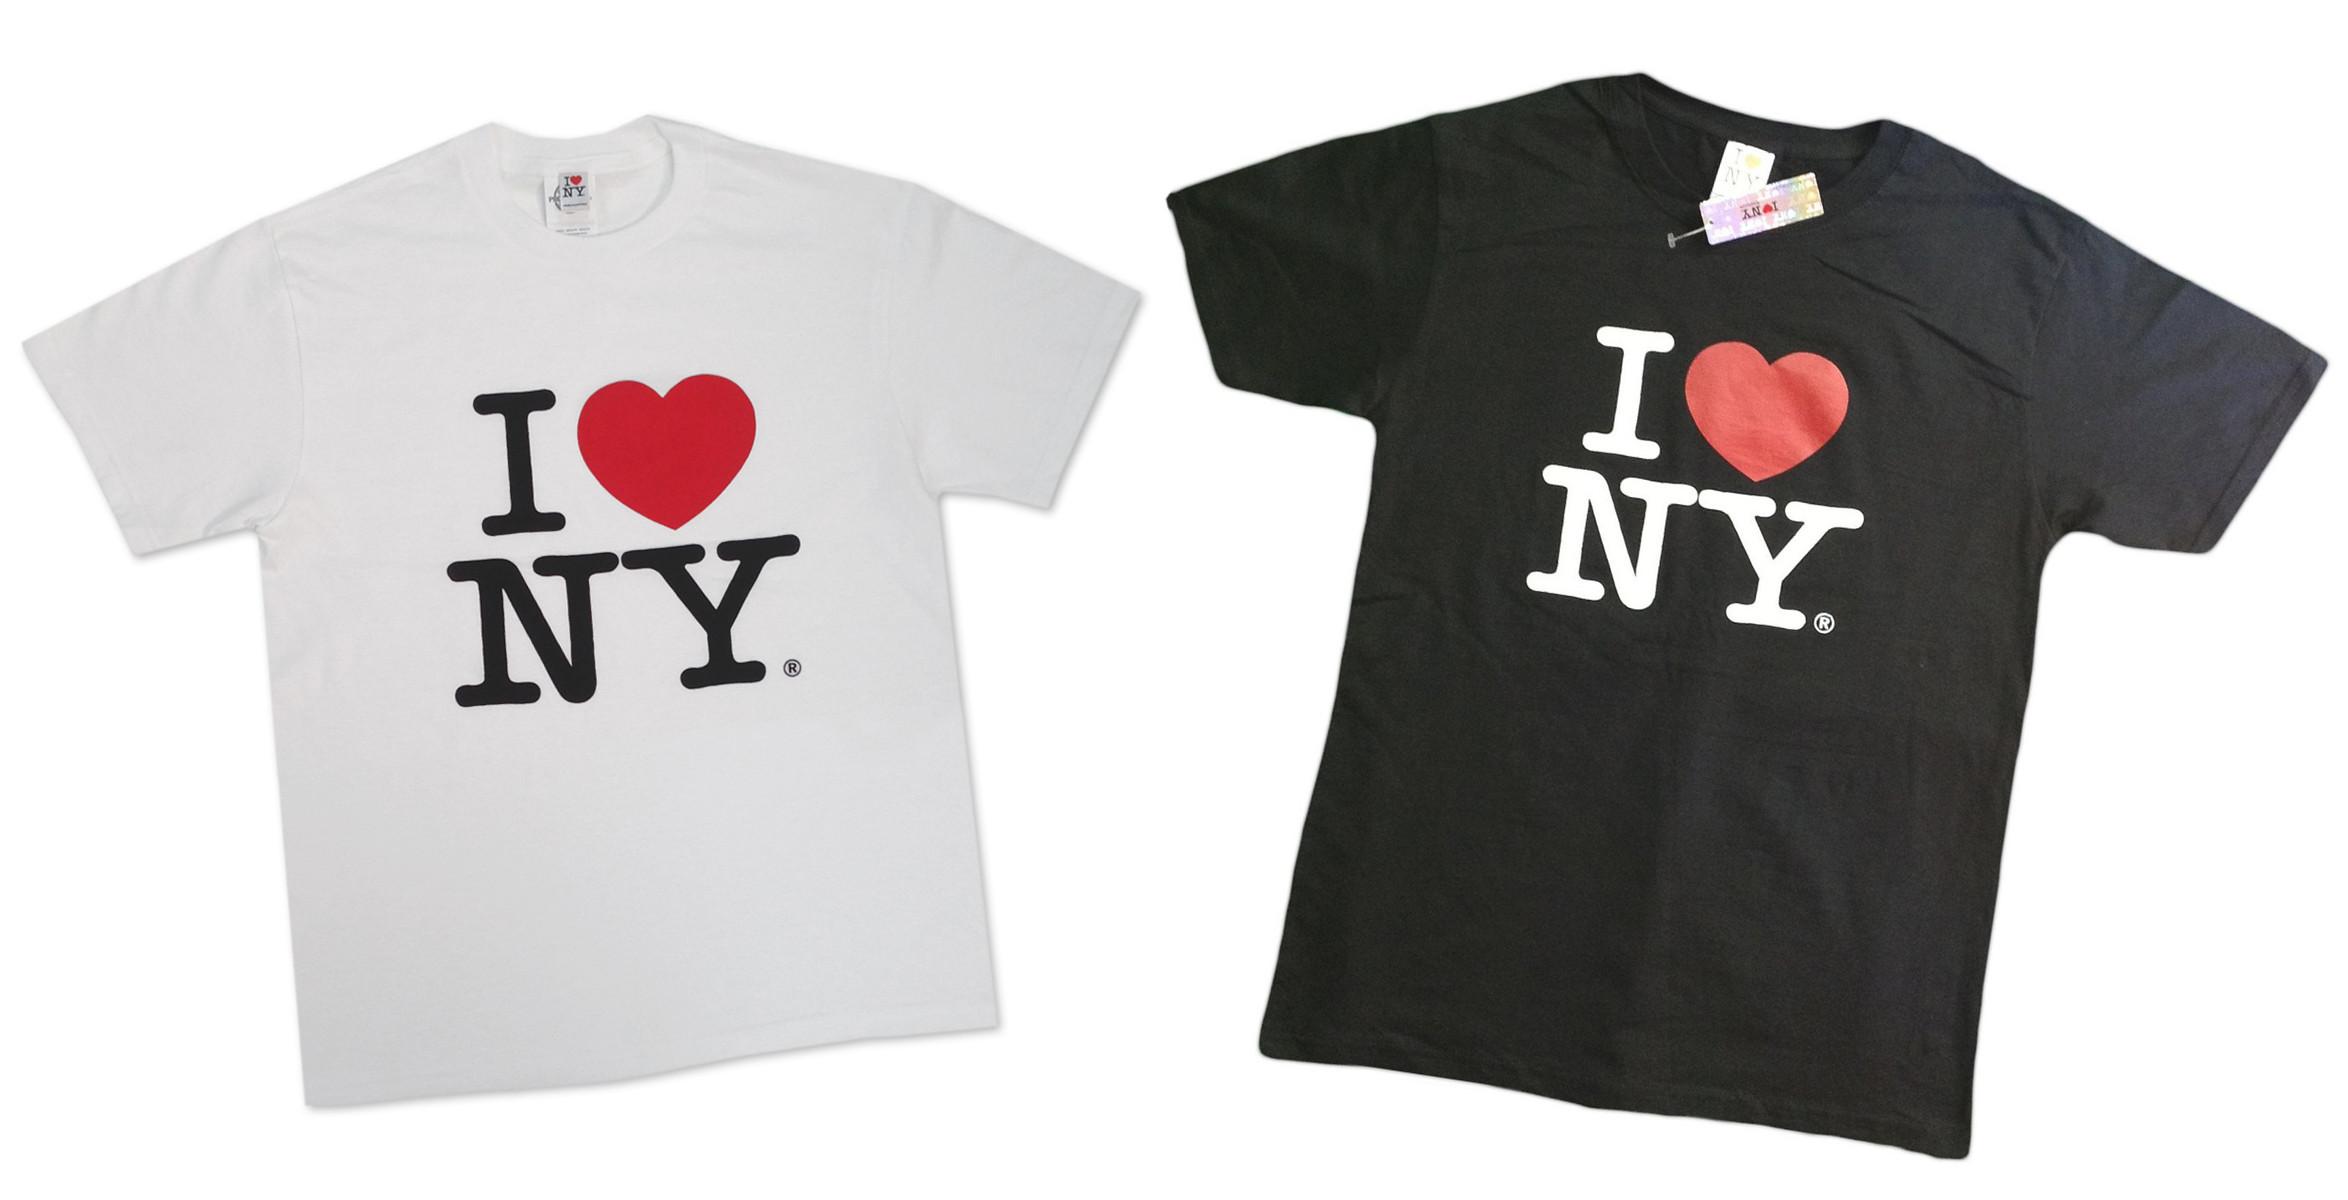 Que ramener de New York ? 30 idées originales et typiques